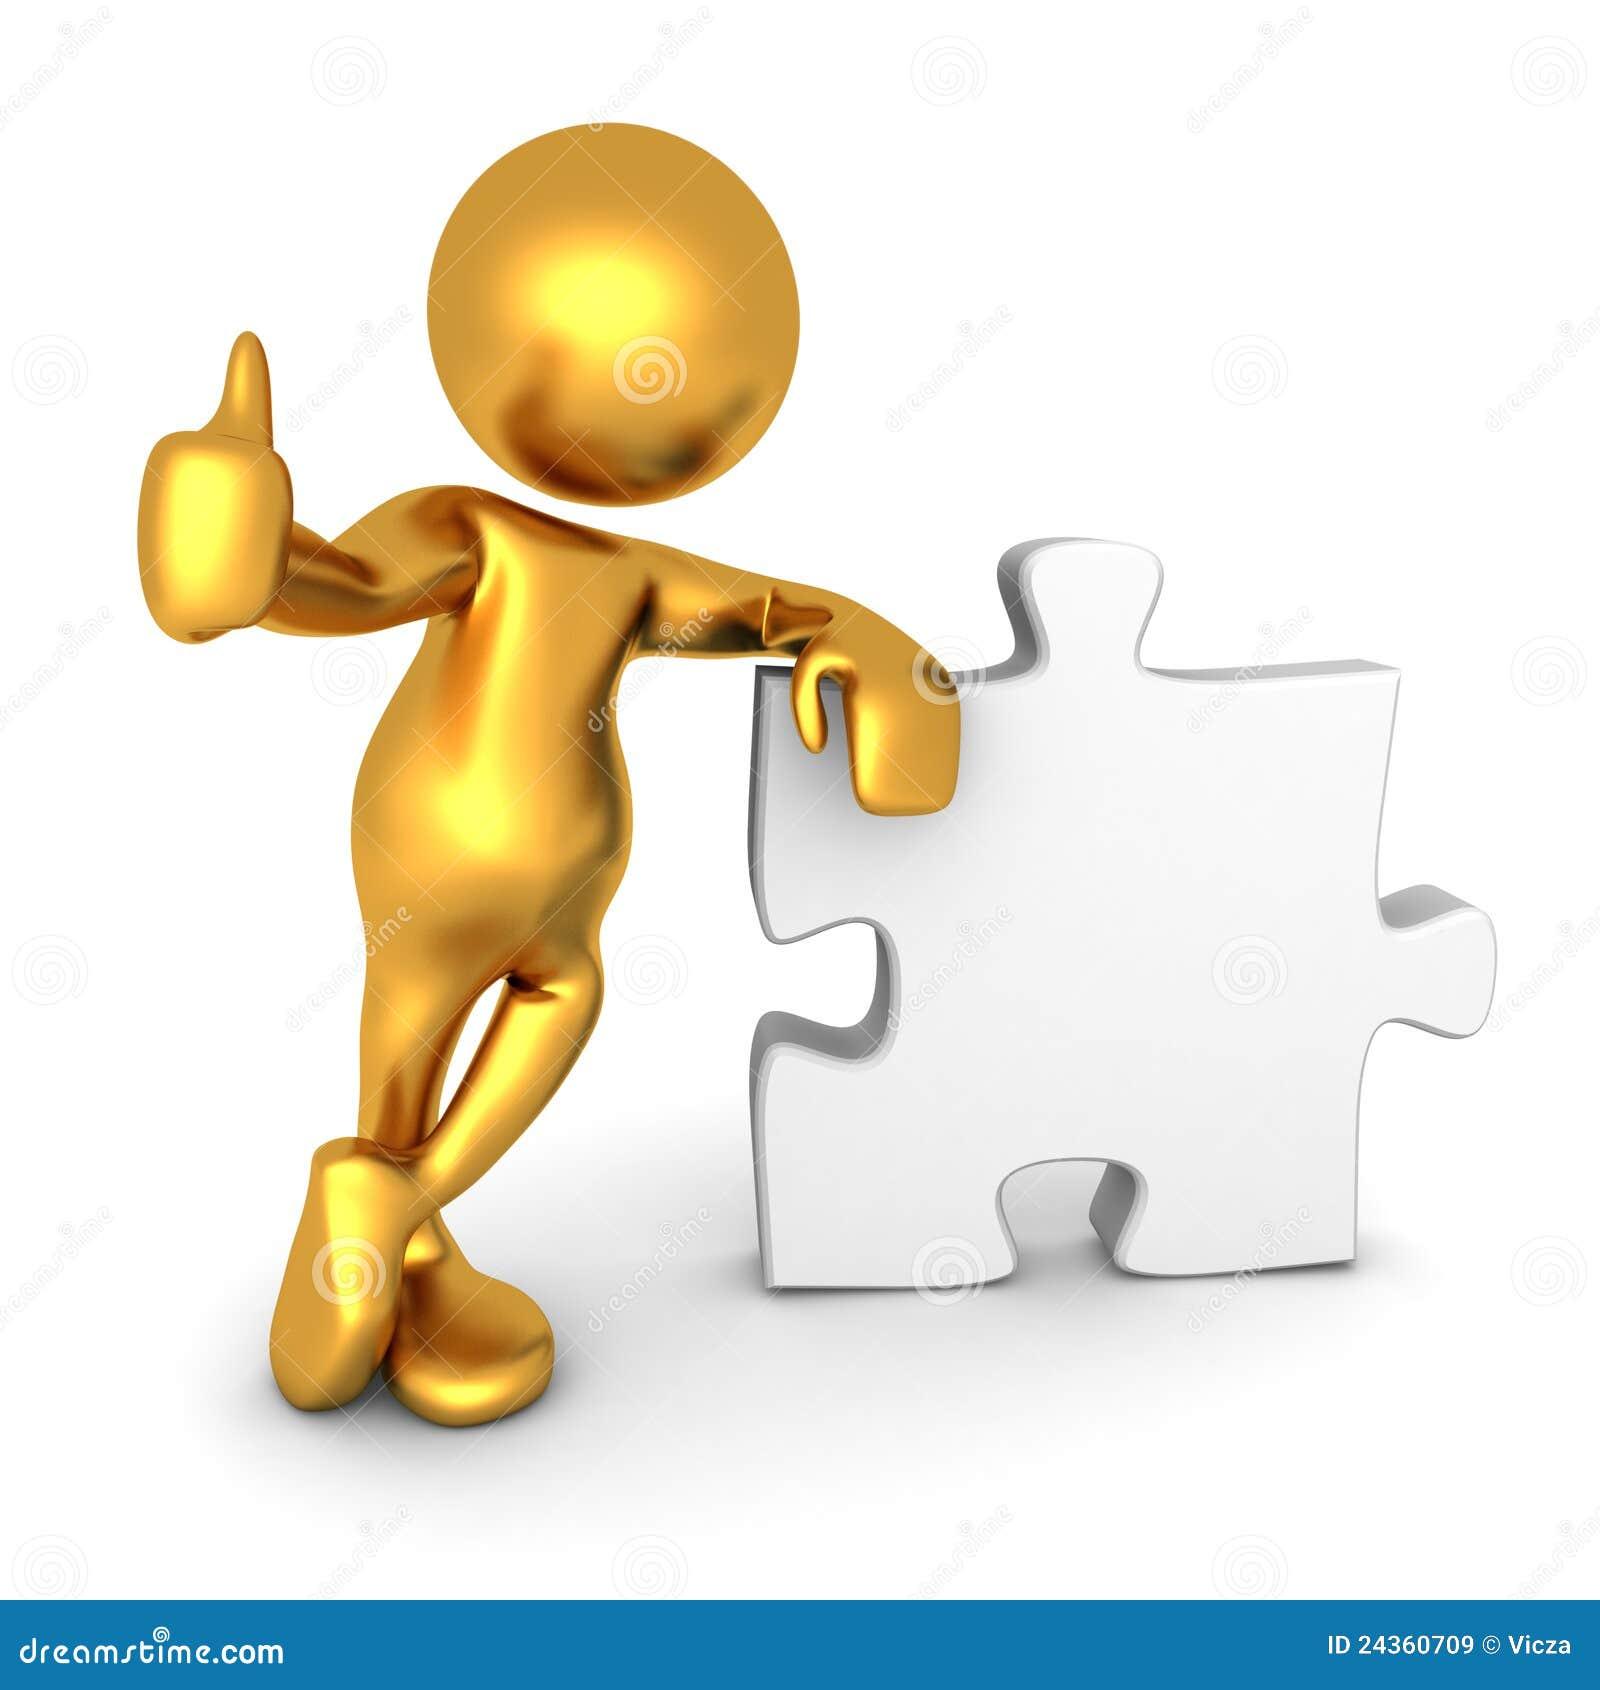 Mr Goldman - Thumbs up puzzle piece